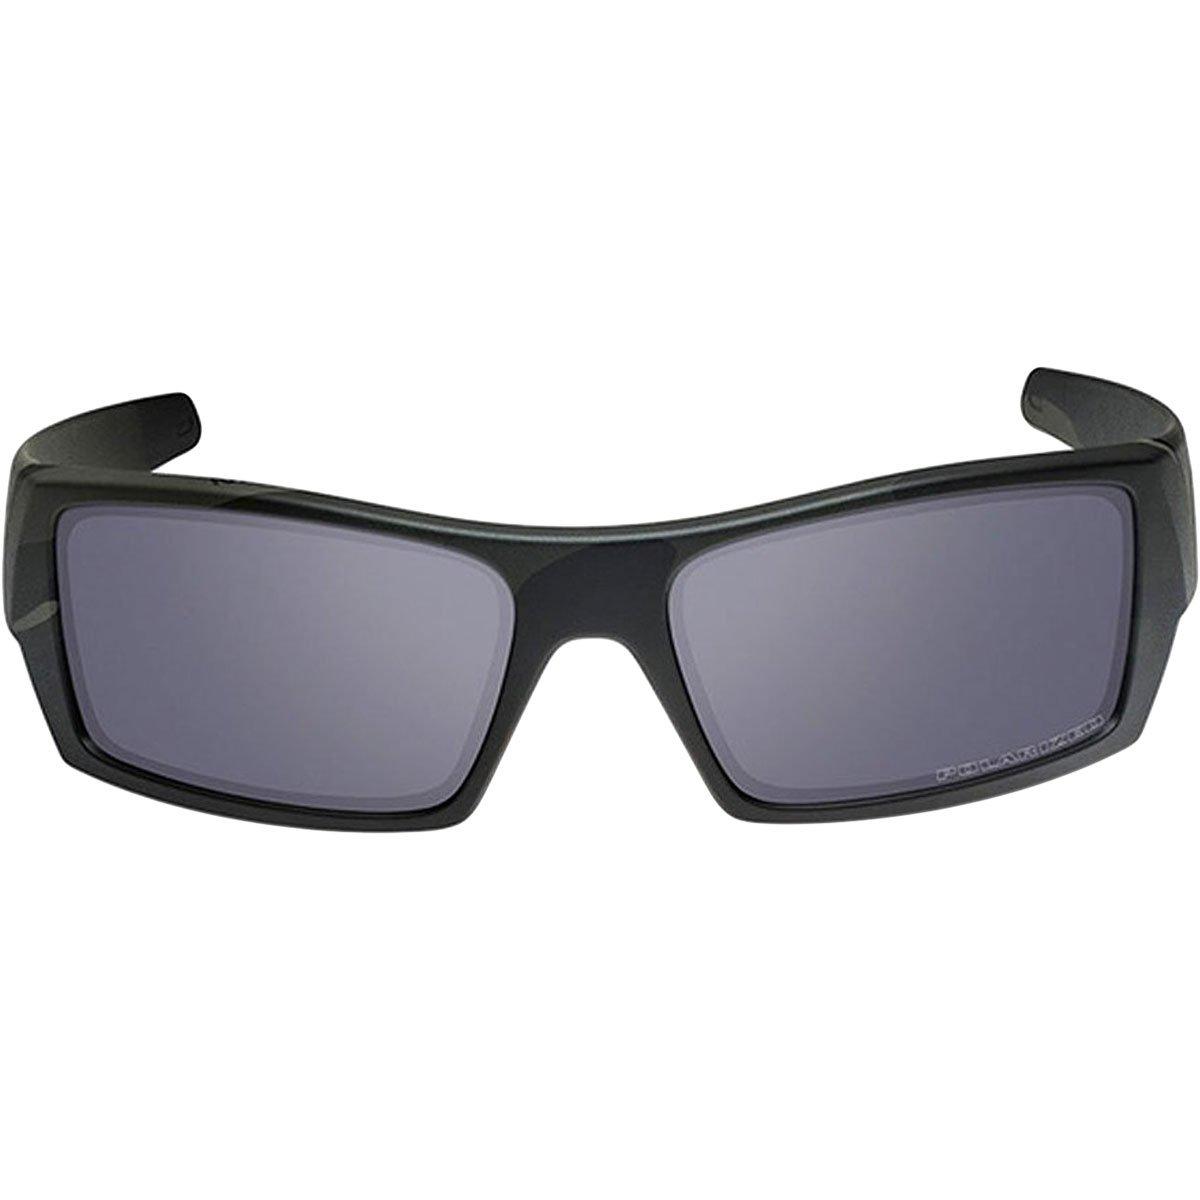 3caa7c6732a0 Amazon.com: Oakley Men's Gascan Polarized Rectangular Sunglasses, Matte  Black, 60 mm: Clothing